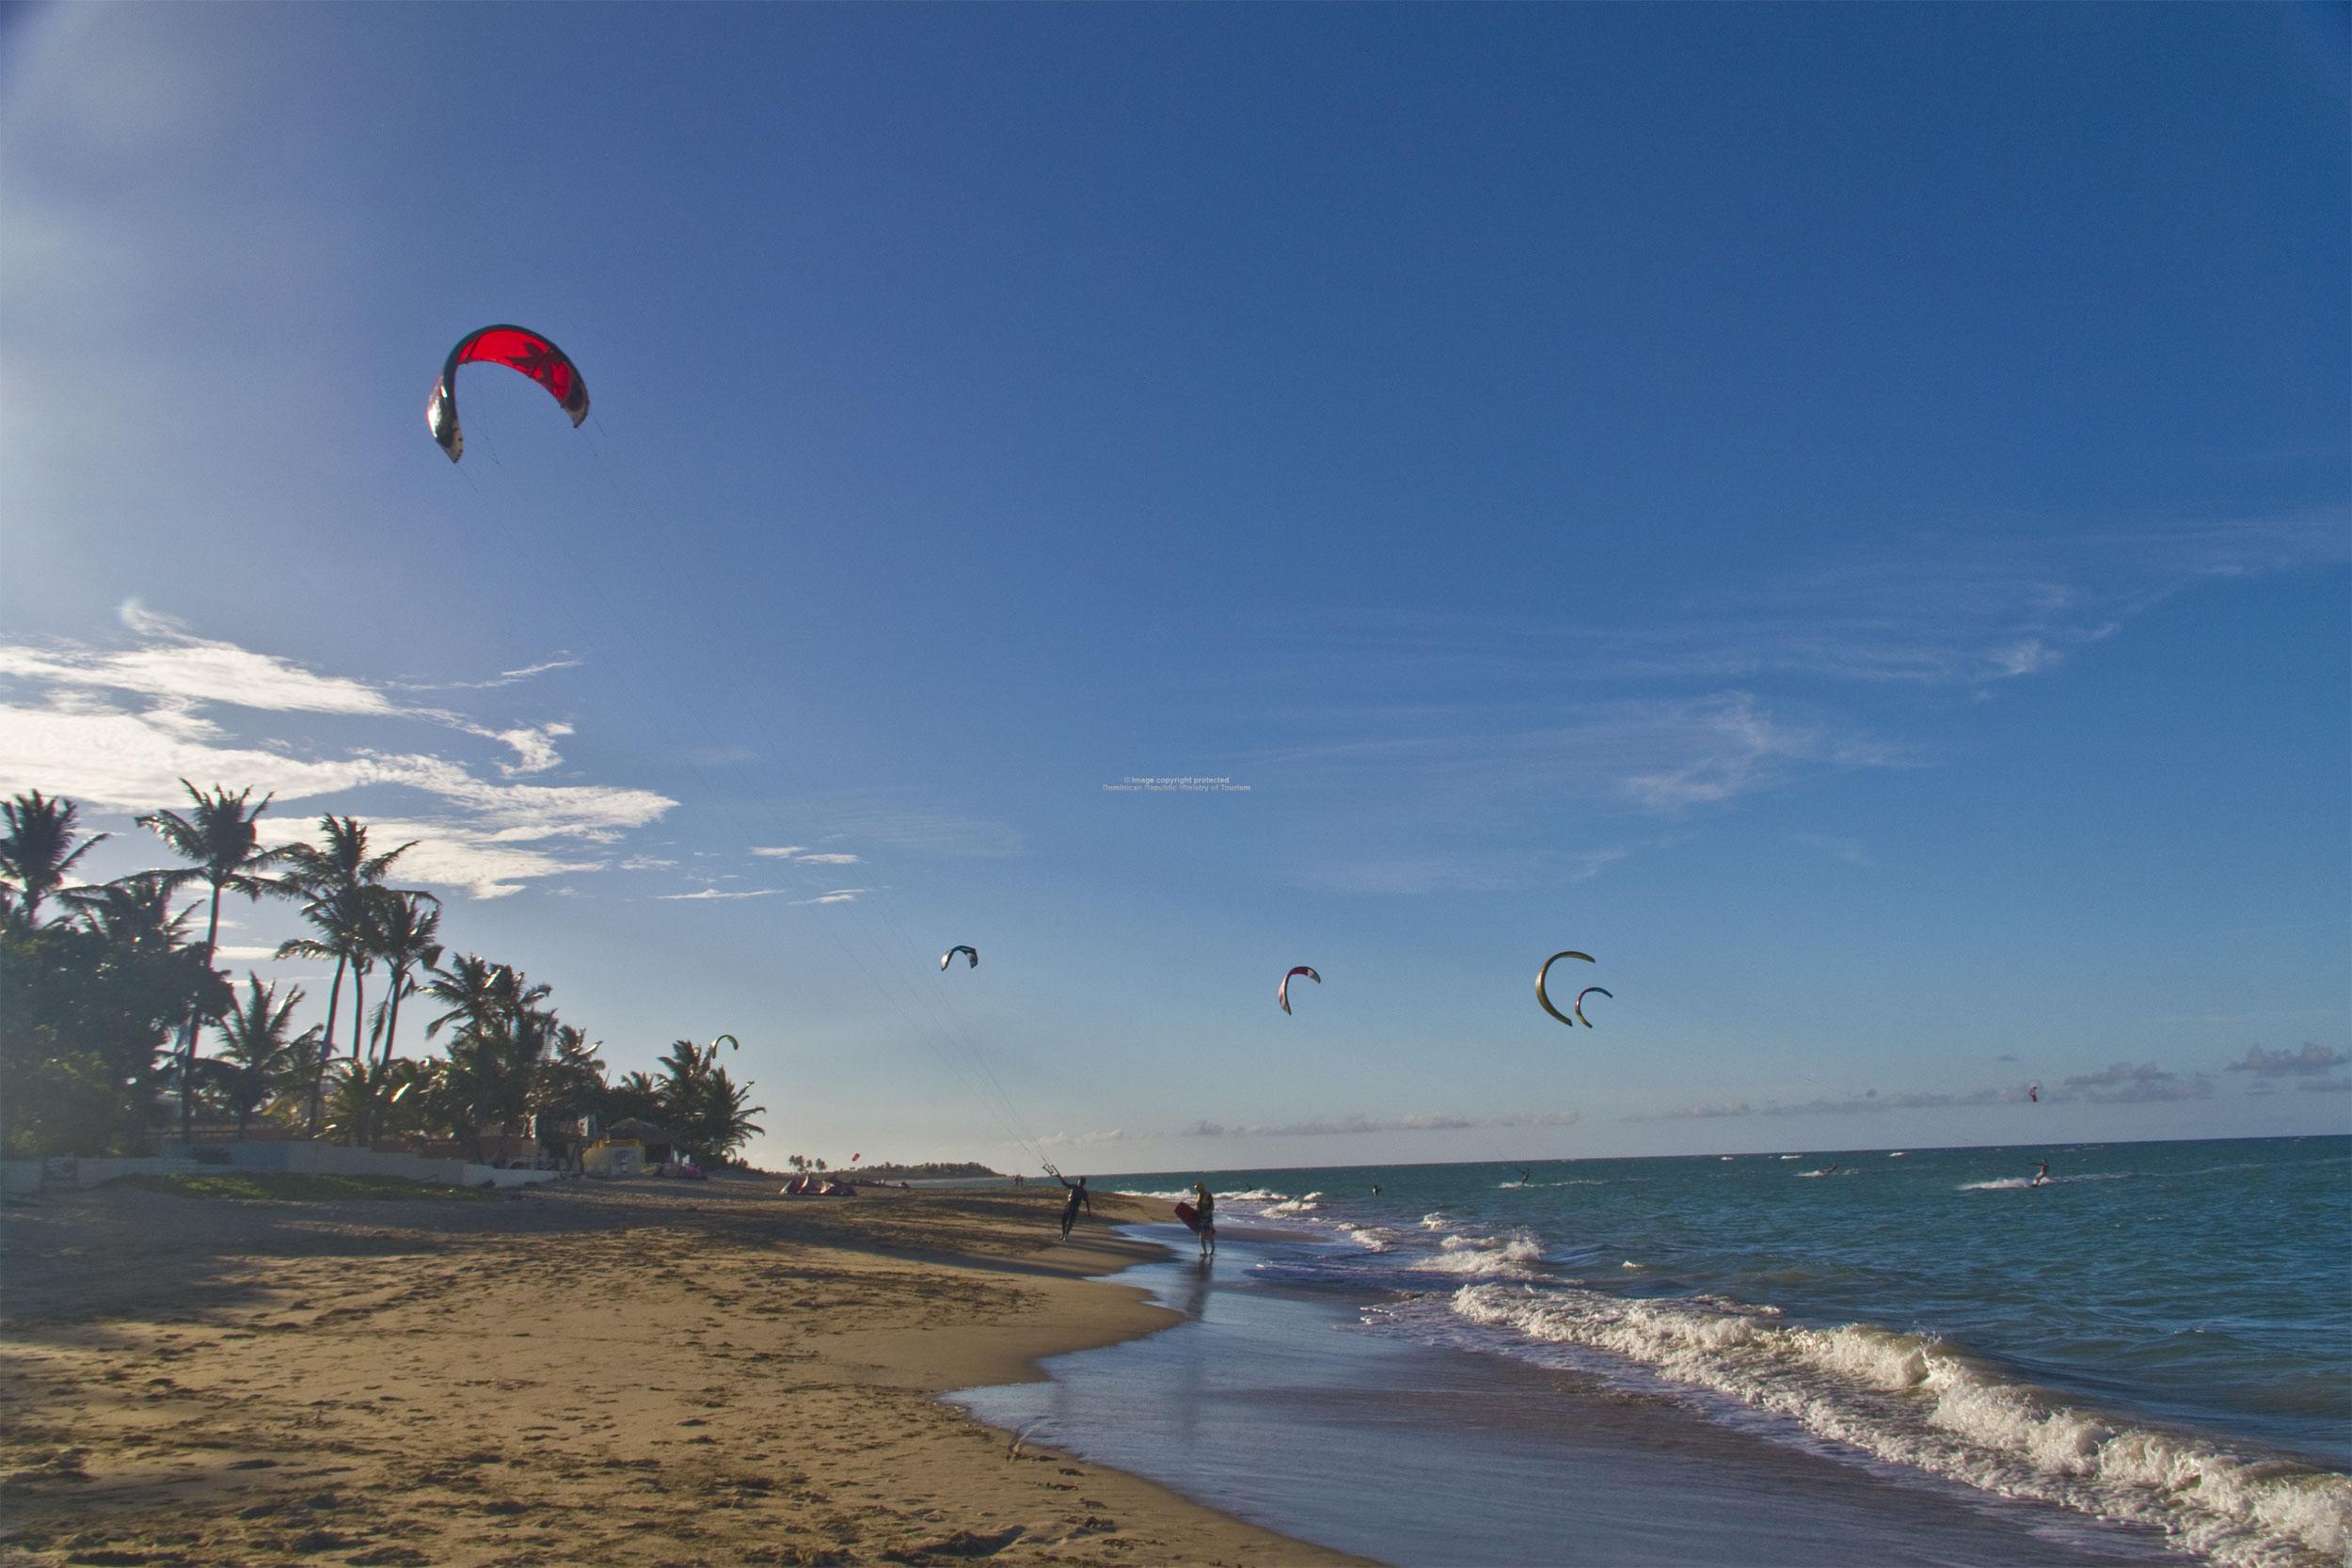 Playa de Cabarete prácticas de kitesurf